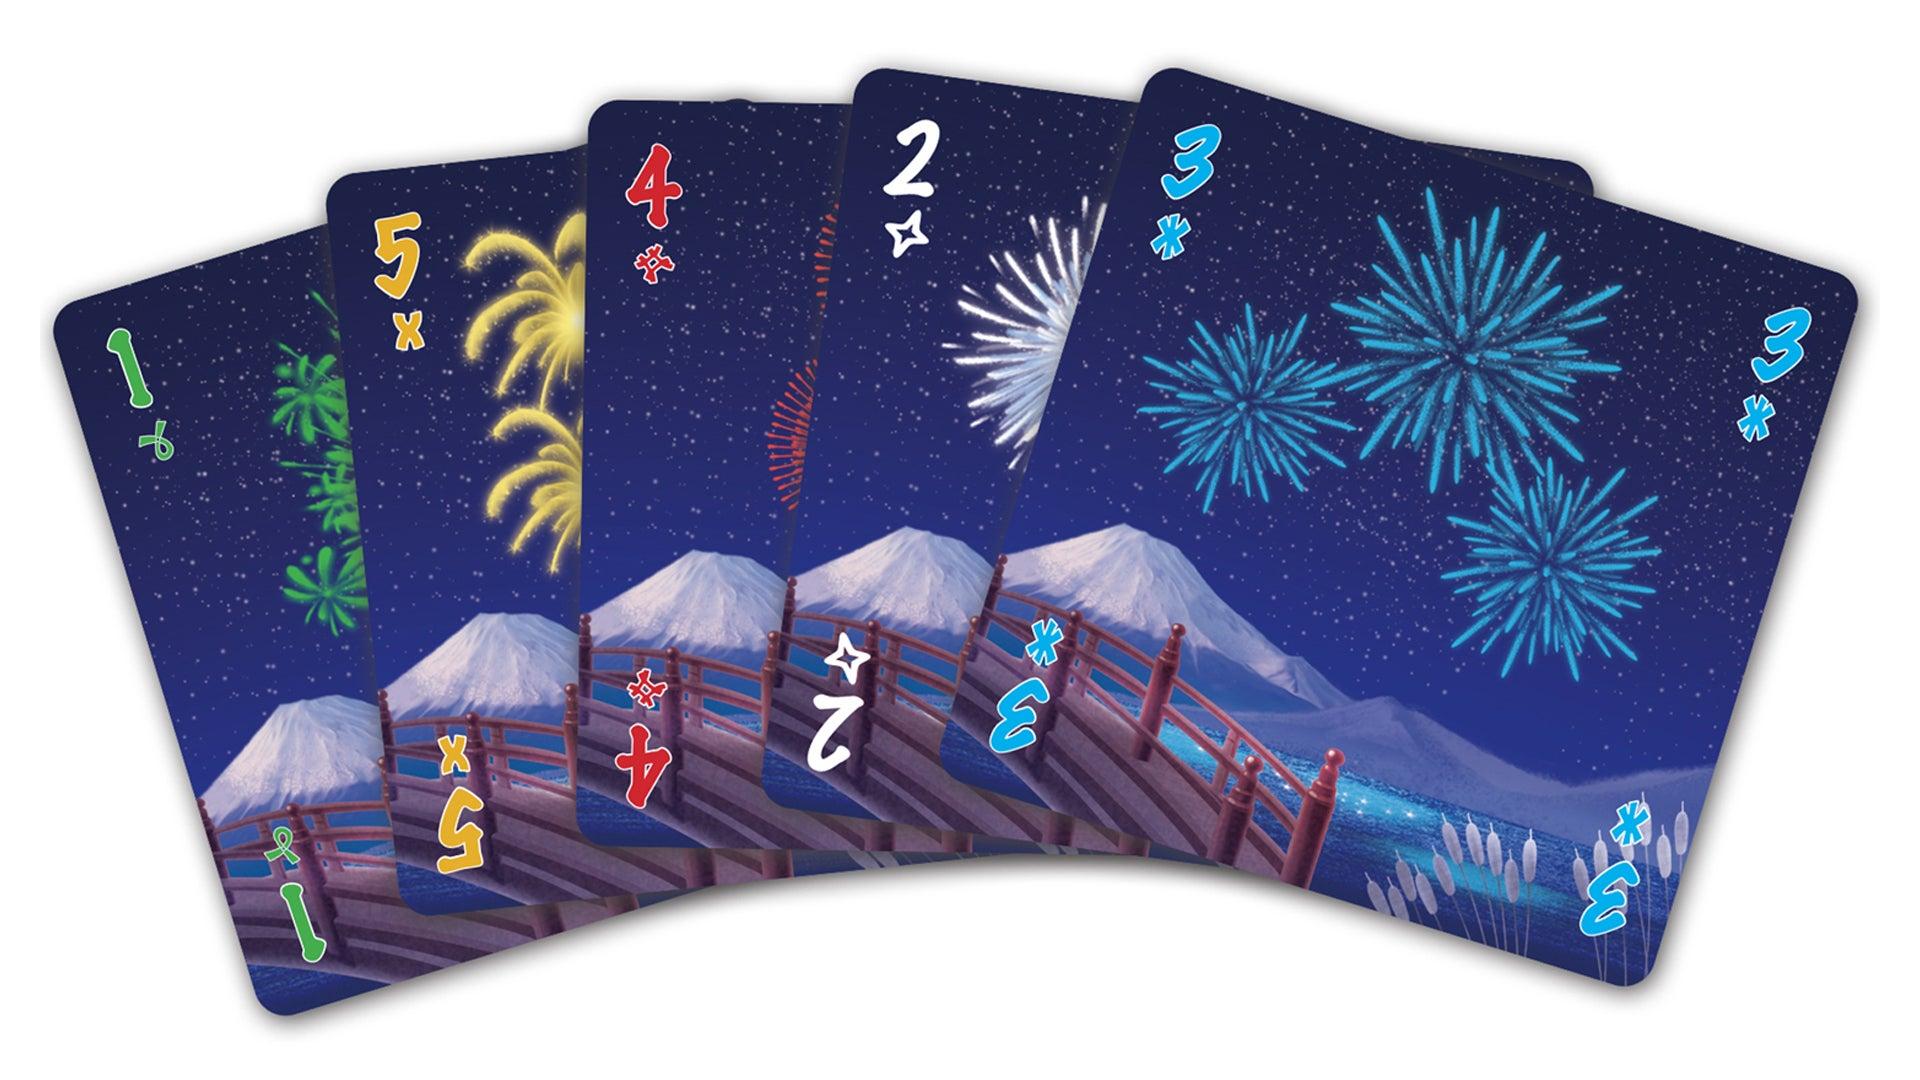 Hanabi family board game cards